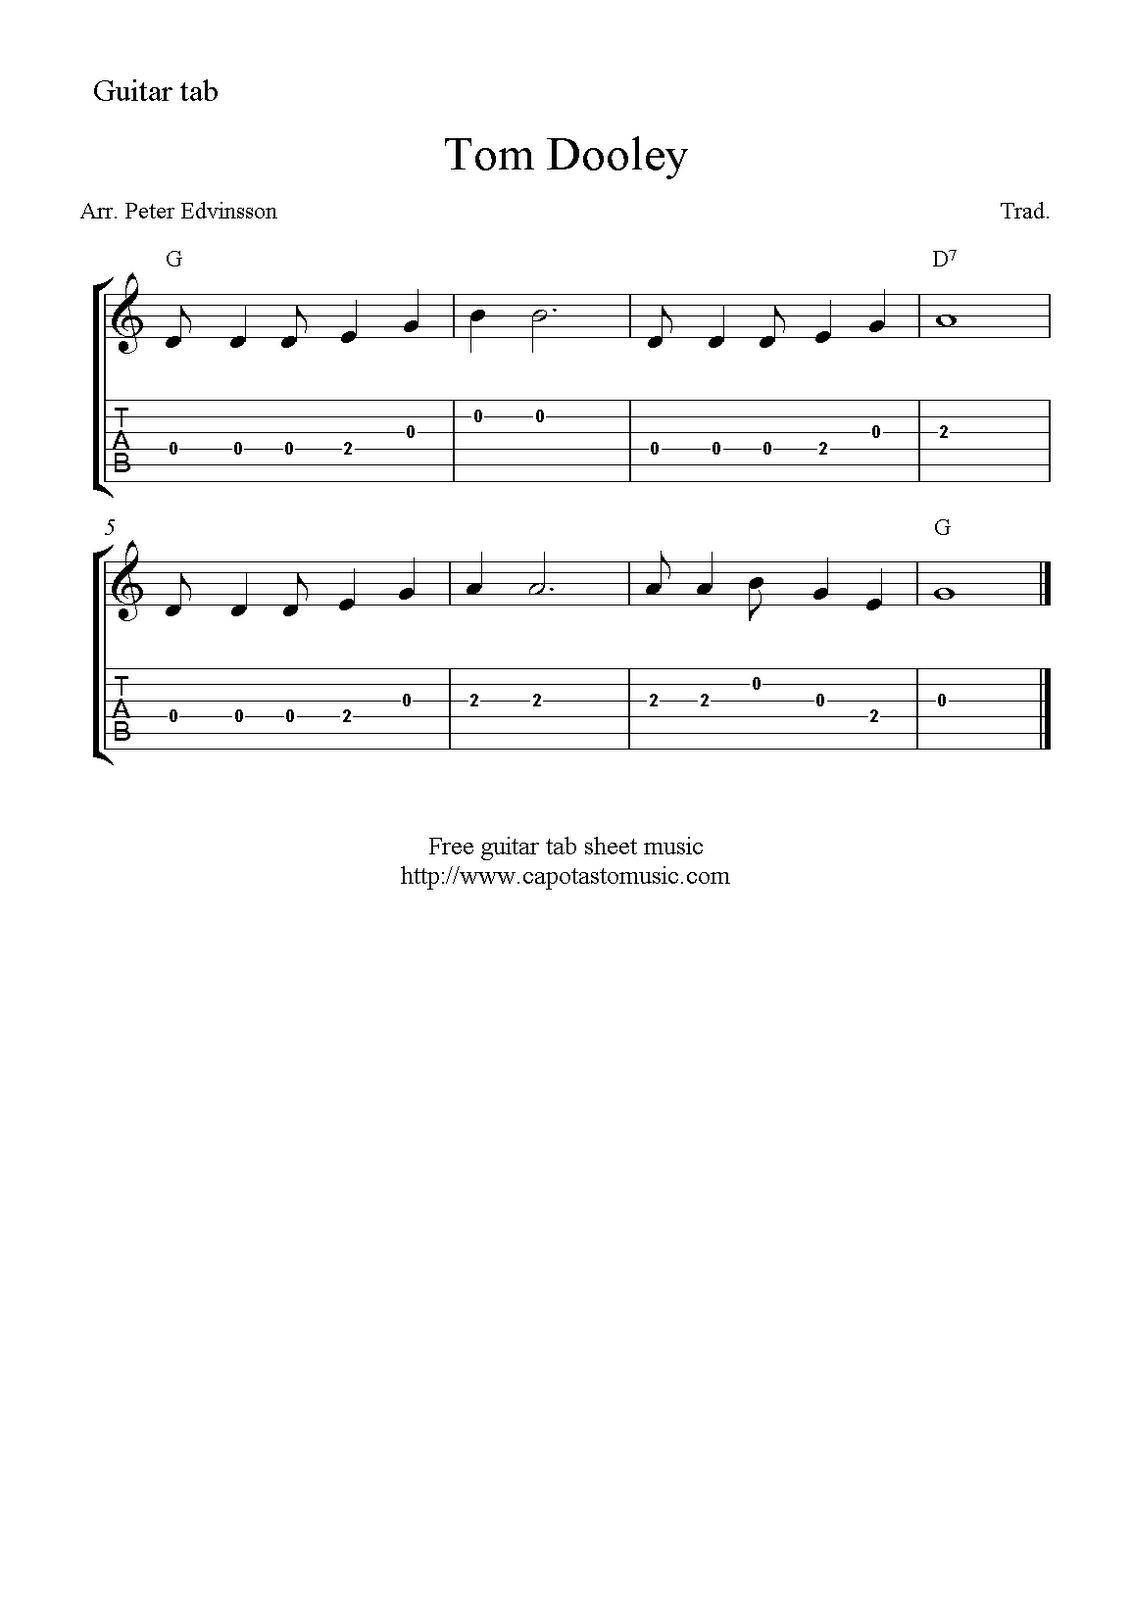 Tom Dooley, easy free guitar tablature sheet music for beginners